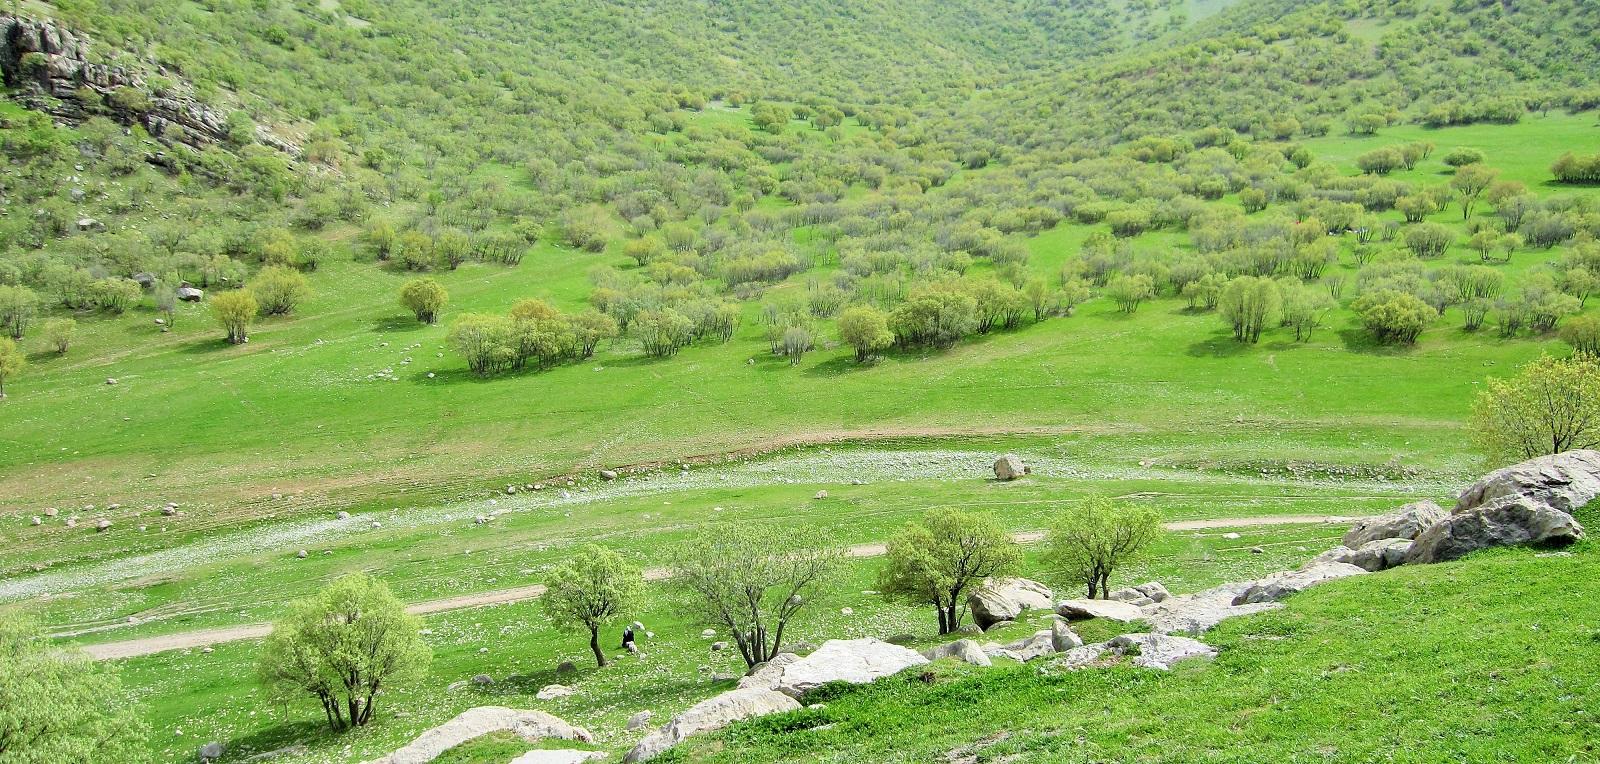 بلوط، بیخ گوش خرمآباد